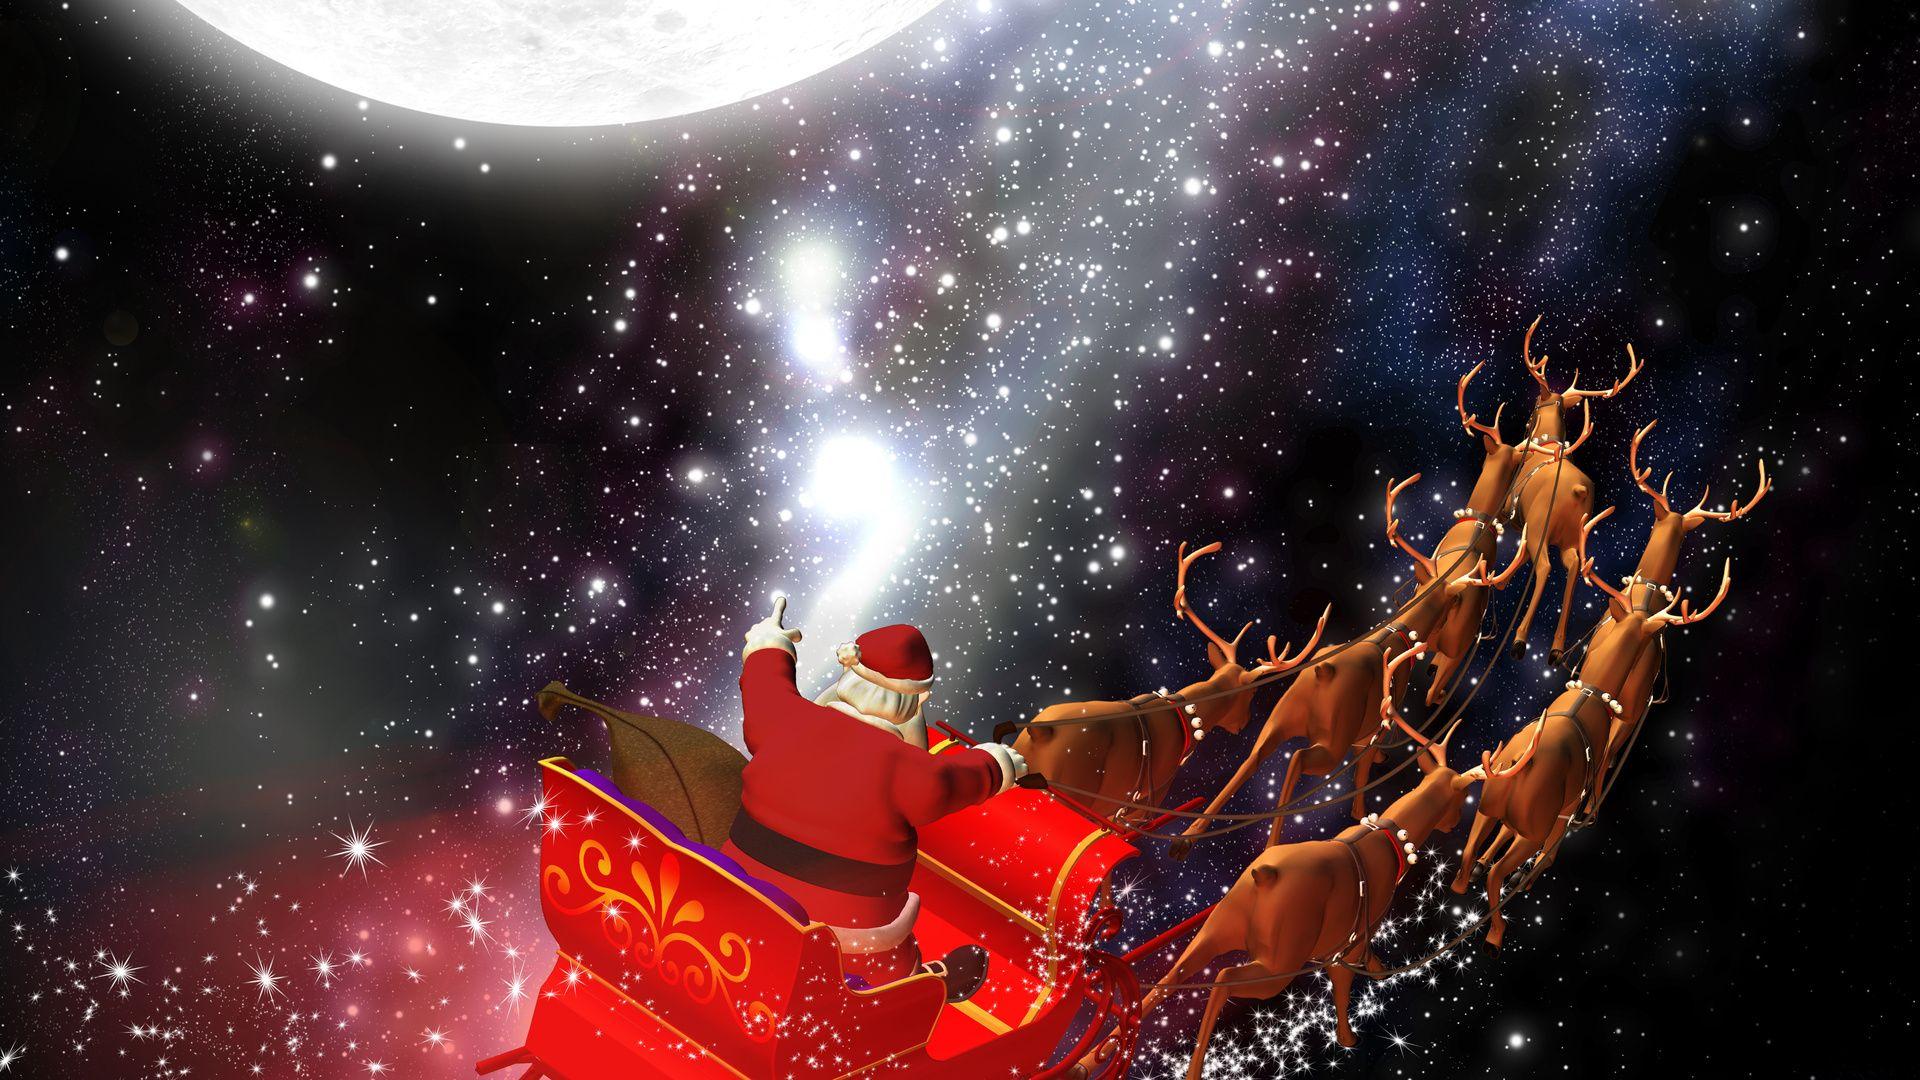 Santa Claus computer wallpaper